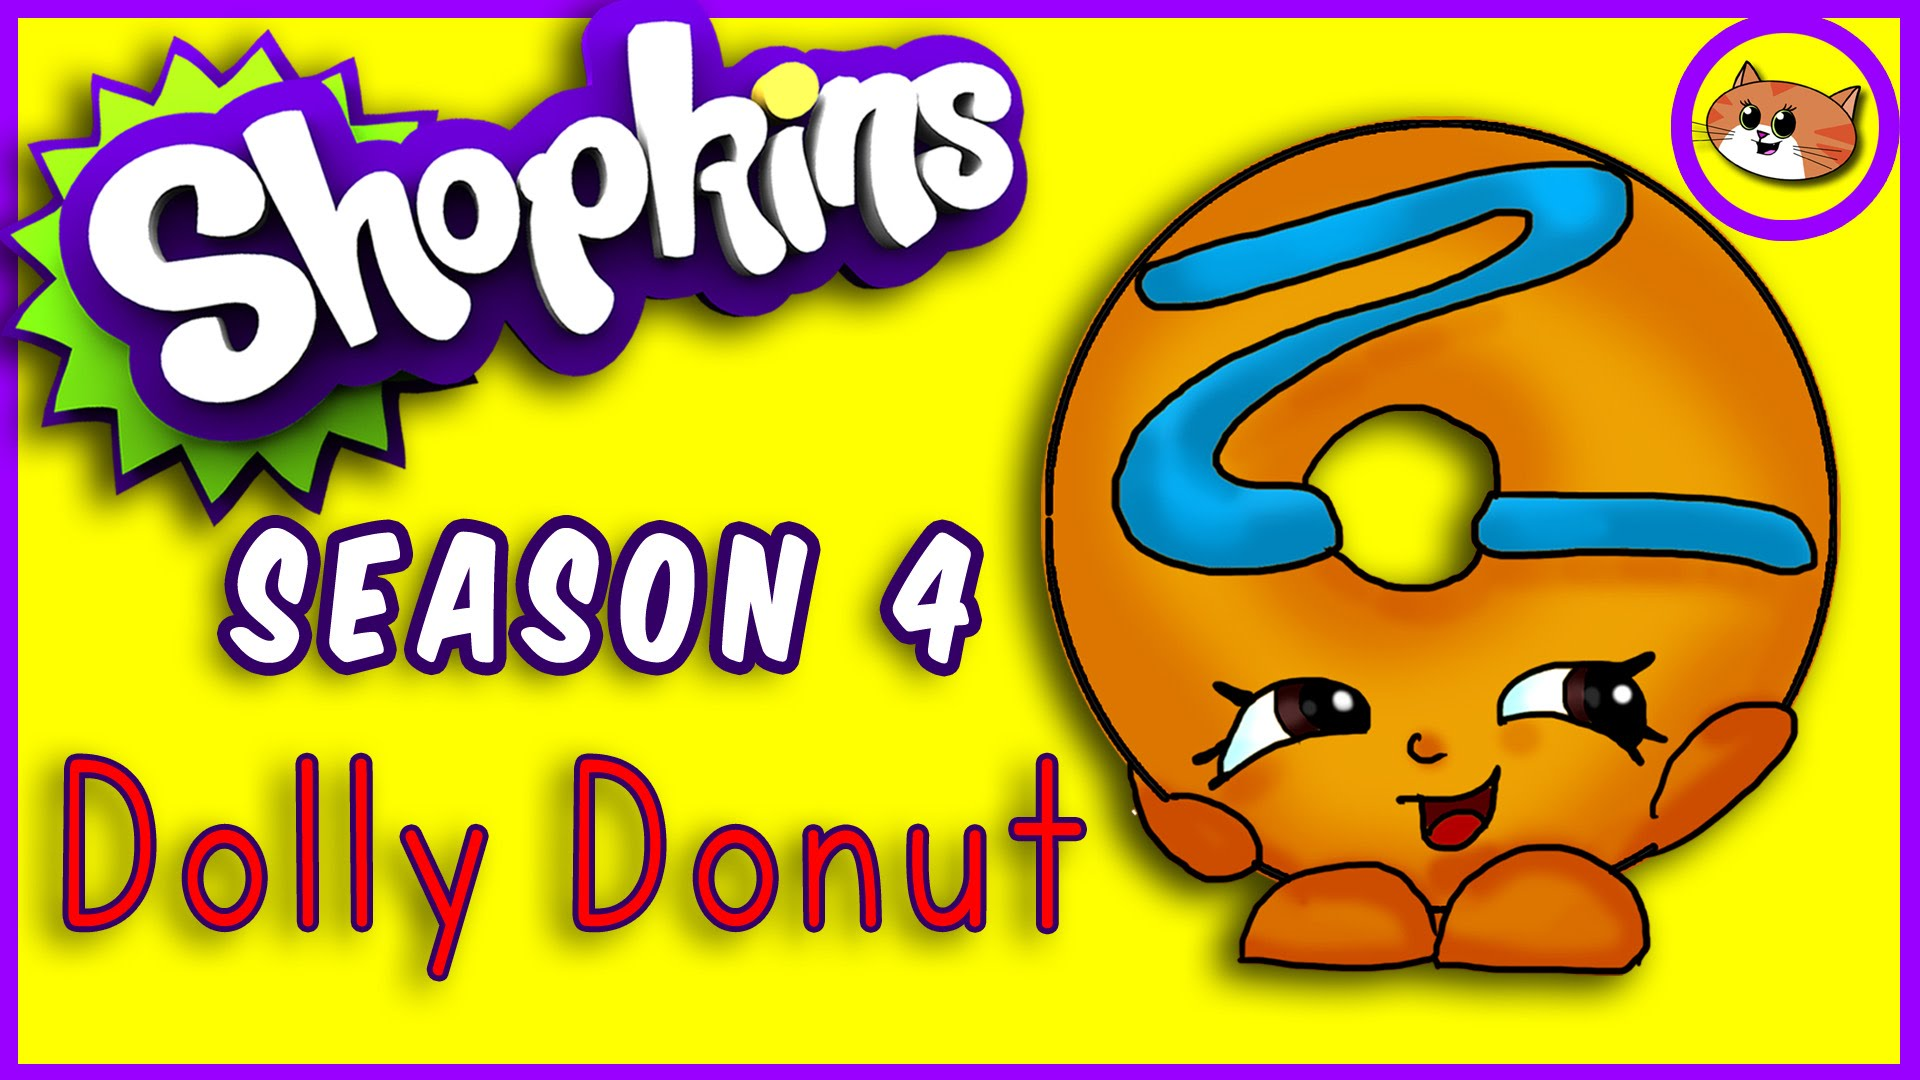 1920x1080 How To Draw Shopkins Season 4 Dolly Donut